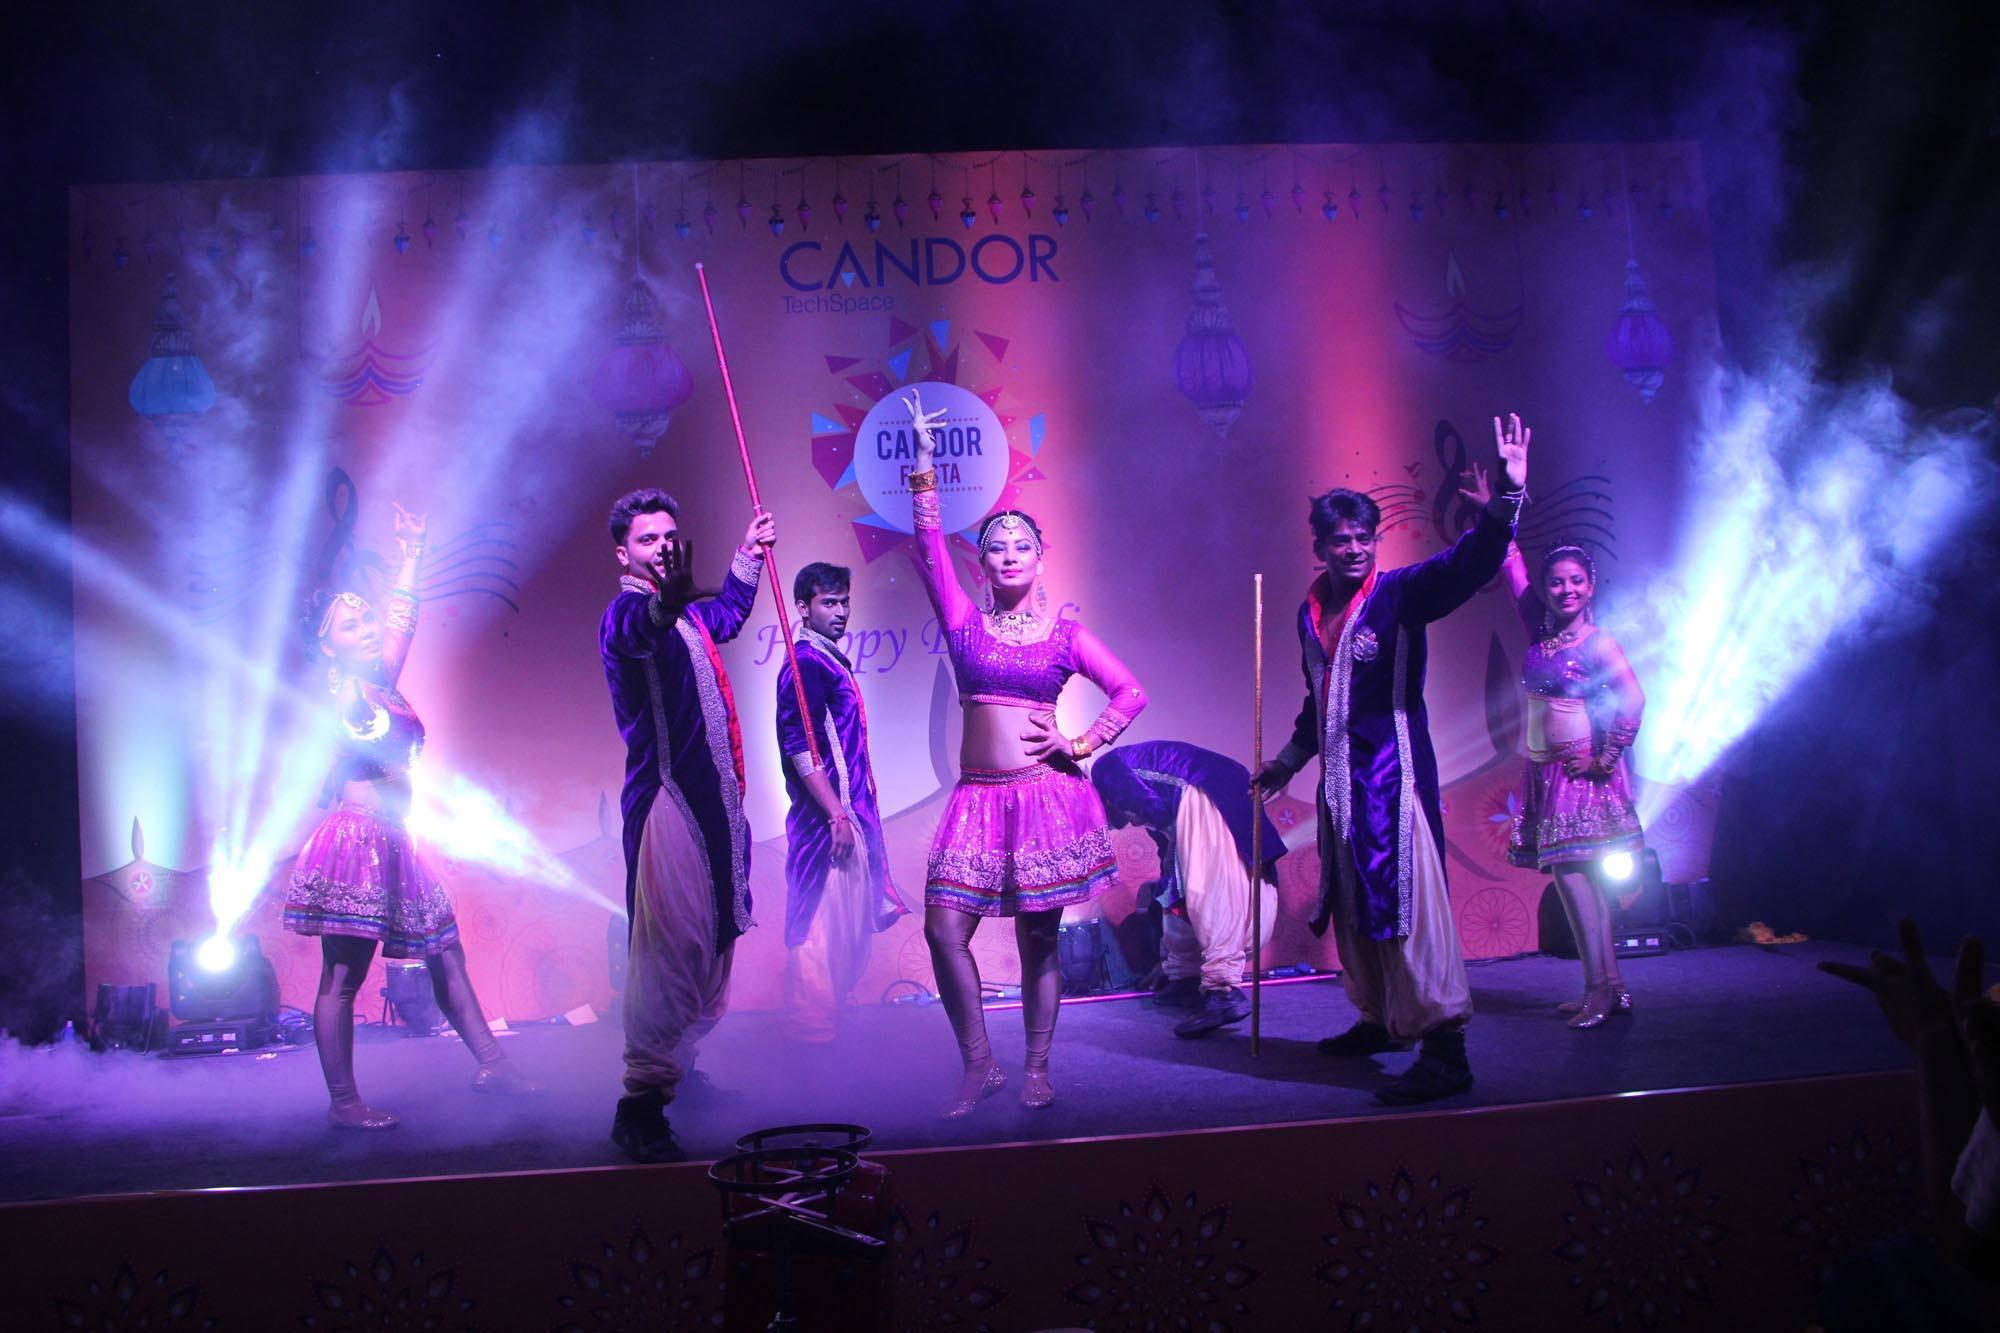 candor-diwali-Noida-62-12.jpg